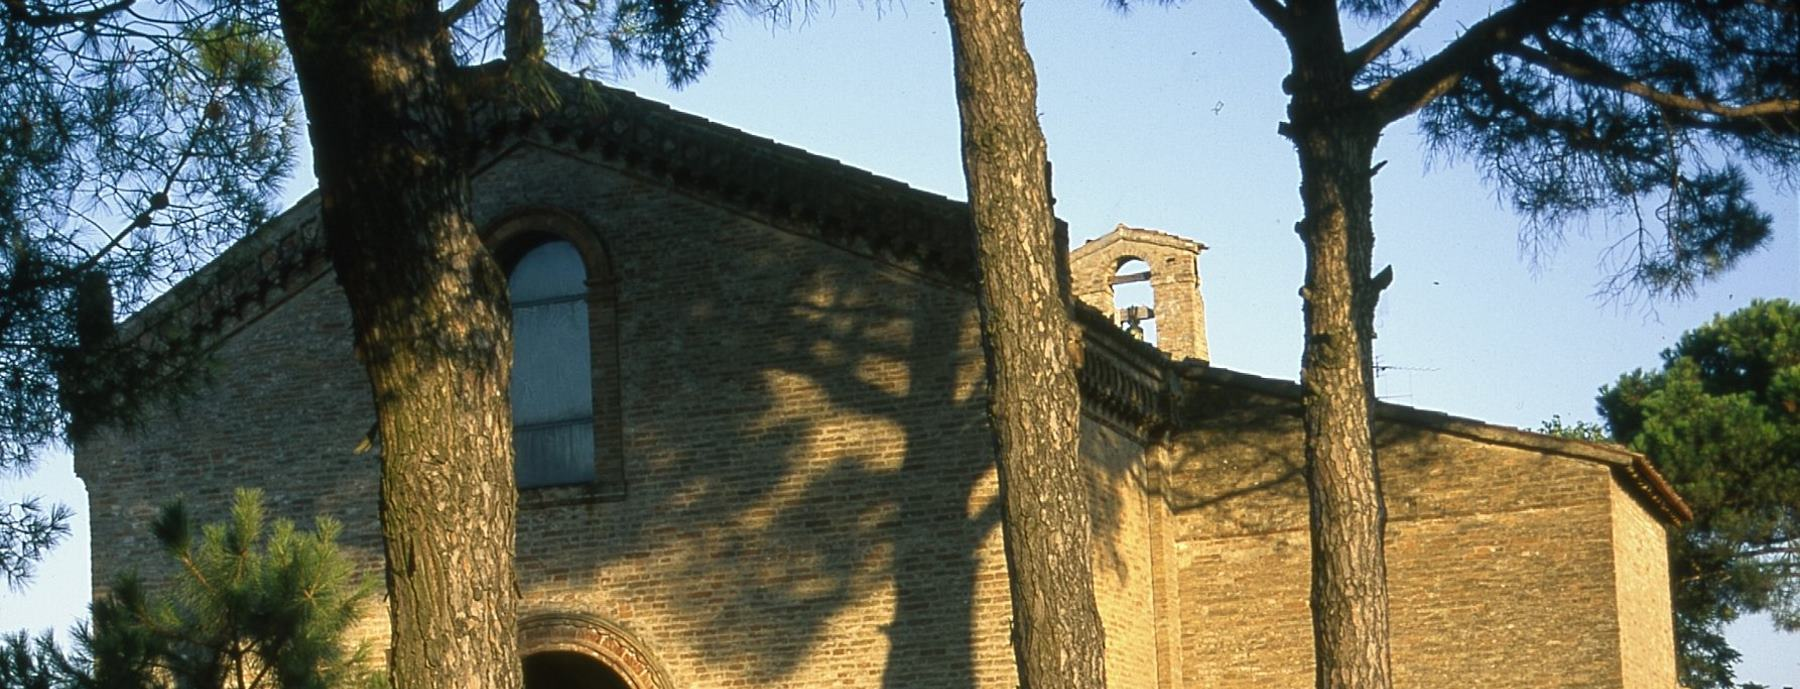 Wallfahrtskirche der Madonna del Pino